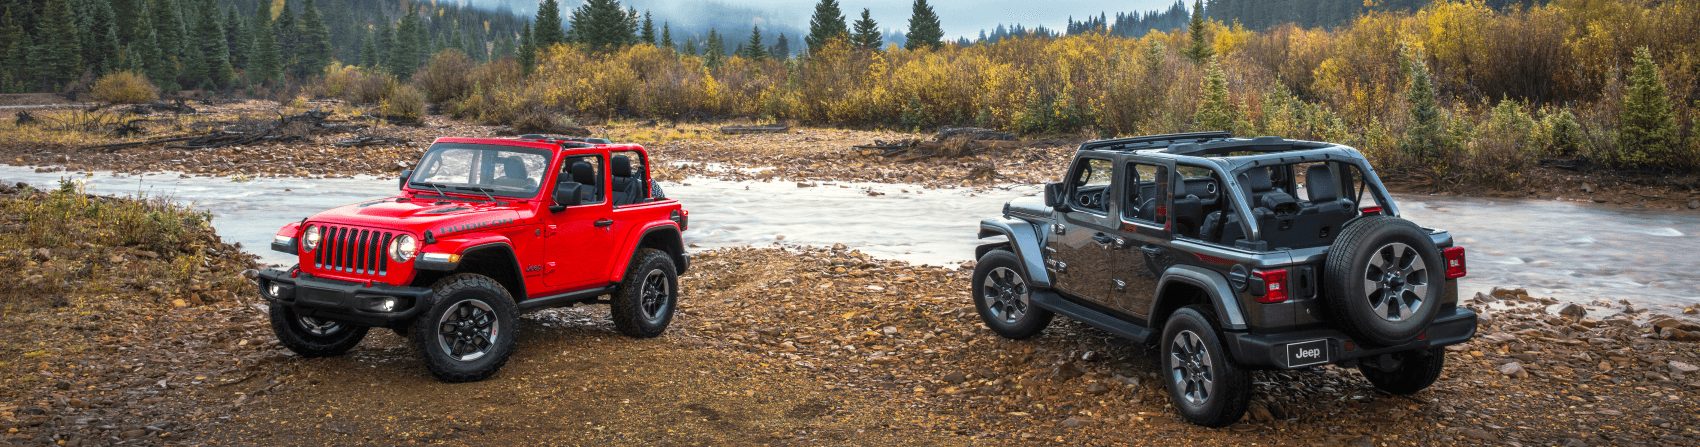 Jeep Wrangler Creek